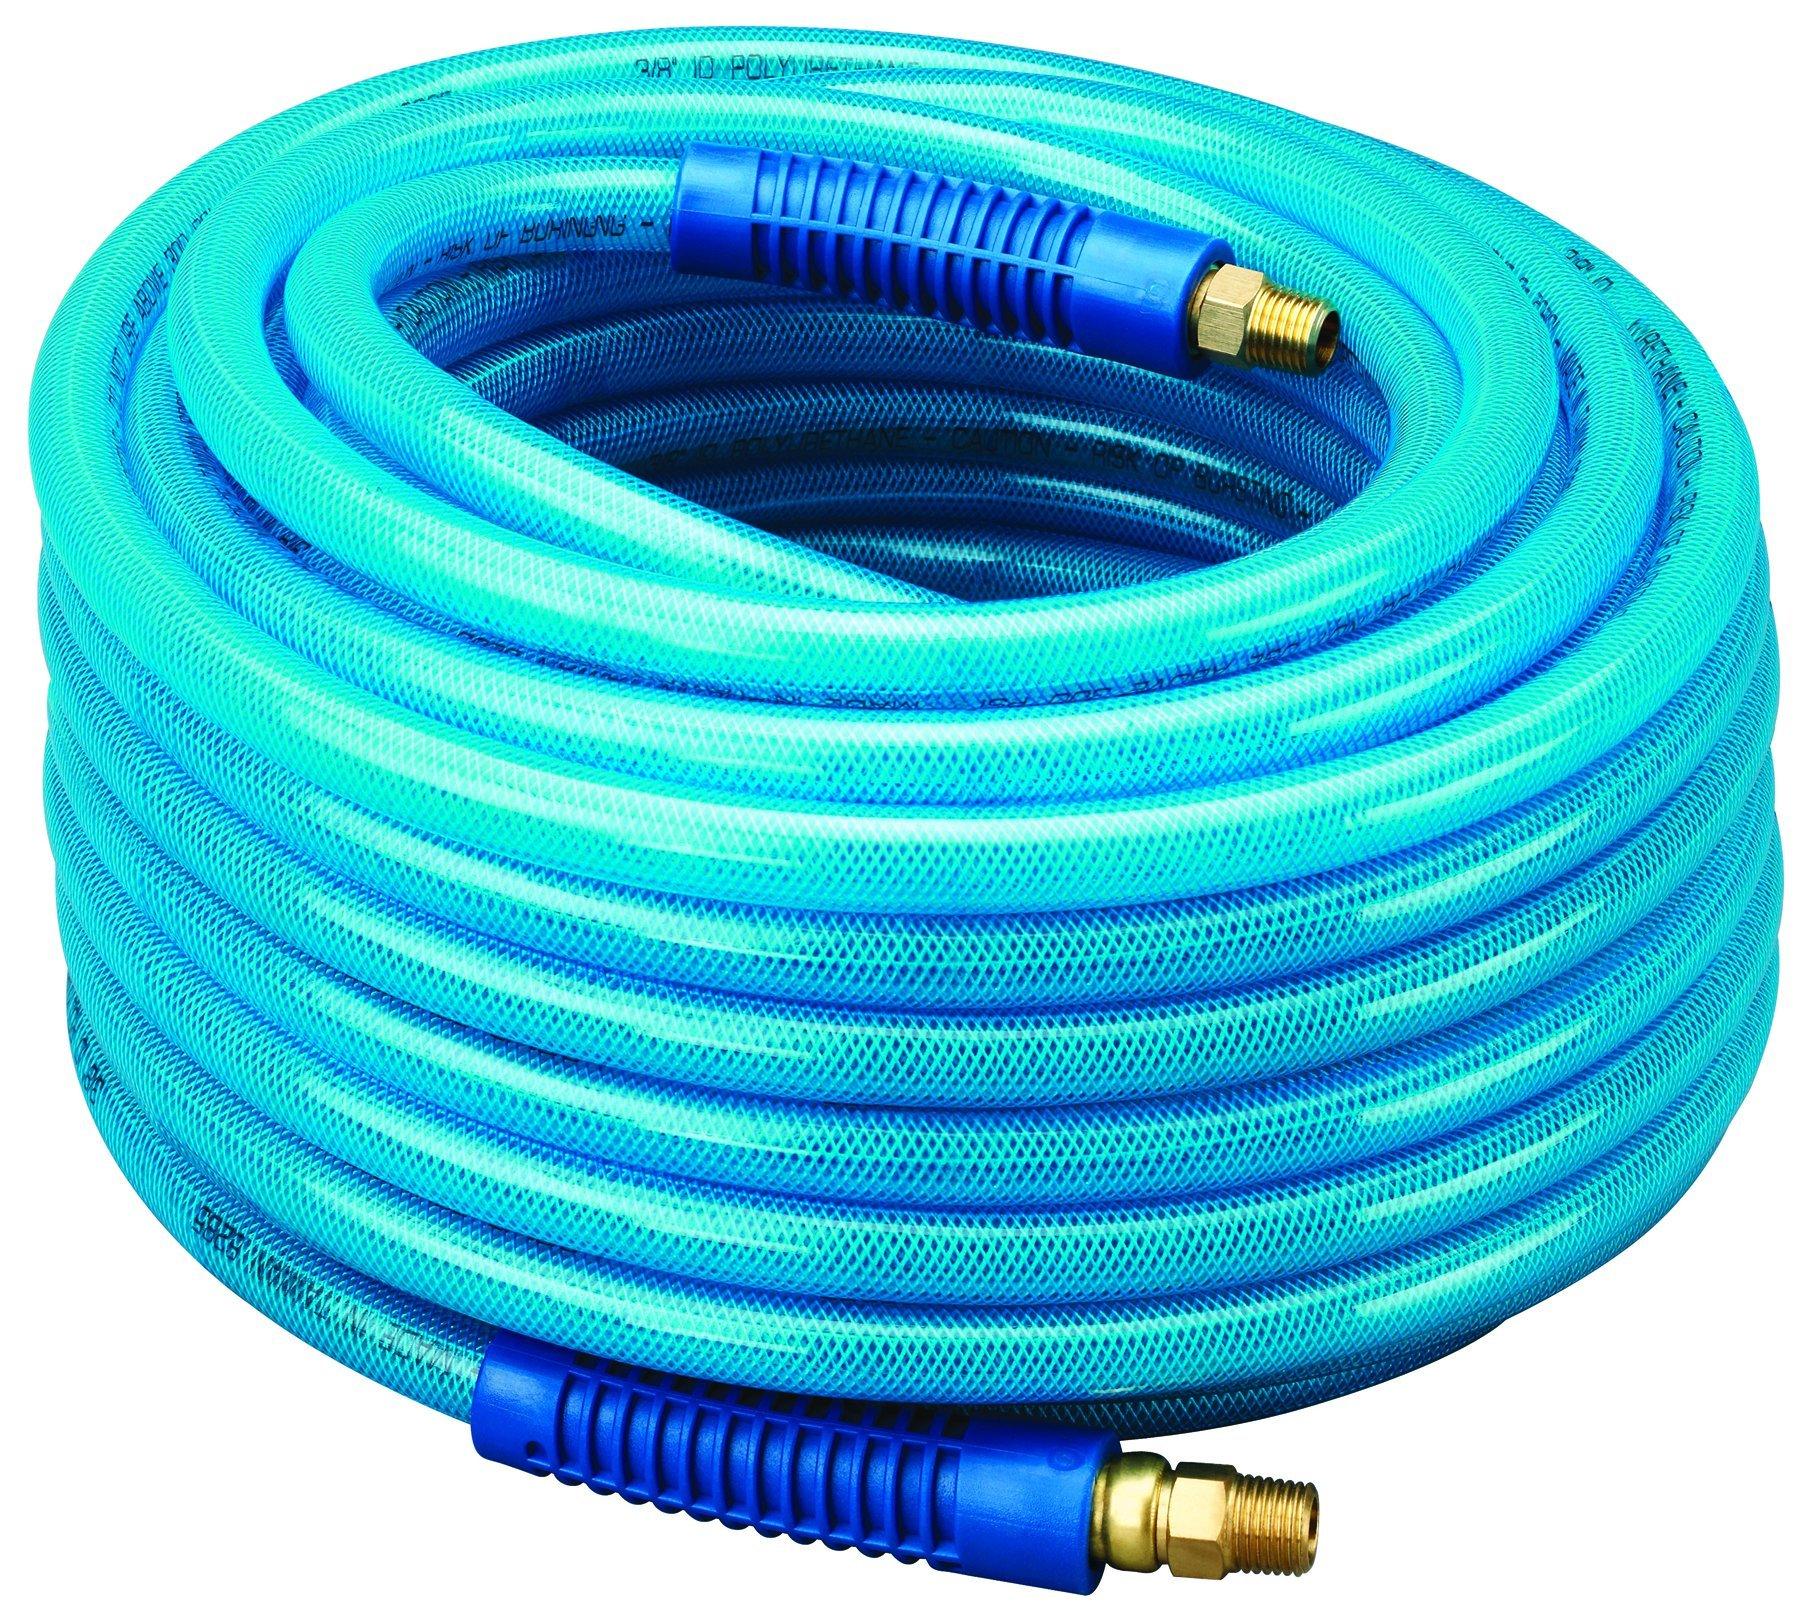 Manguera neumatica : Amflo 13-100AE Blue 300 PSI 3/8 x 30mt